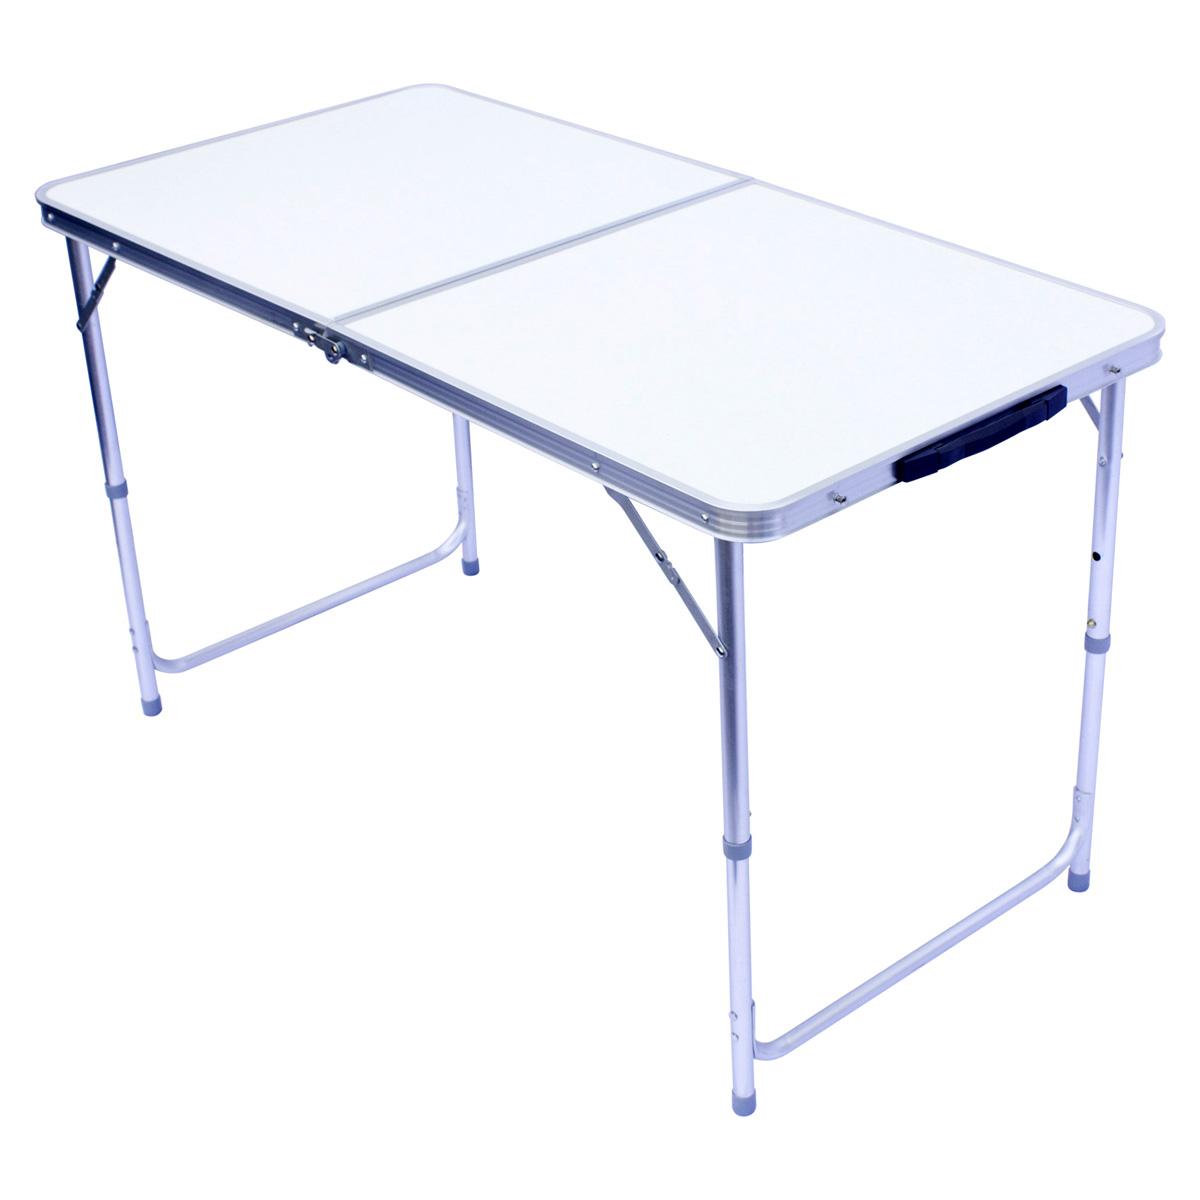 Alu table de camping table 120x60cm base pliable table pliante table de jardin aluminium falttisch